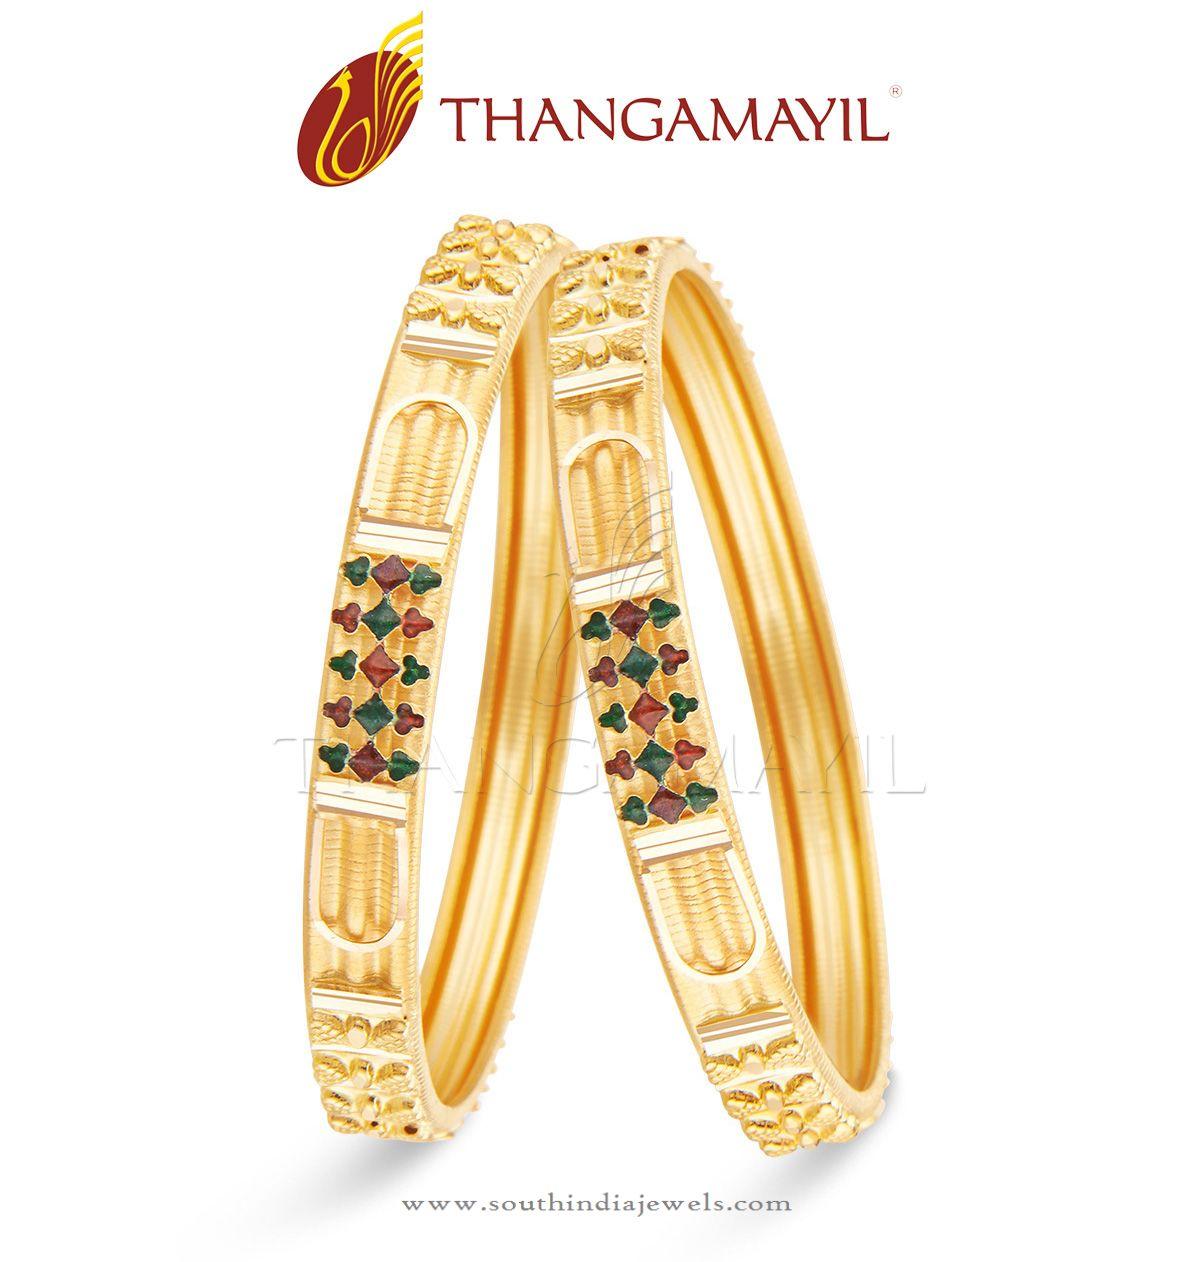 22 Carat Indian Gold Bangle Design South India Jewels